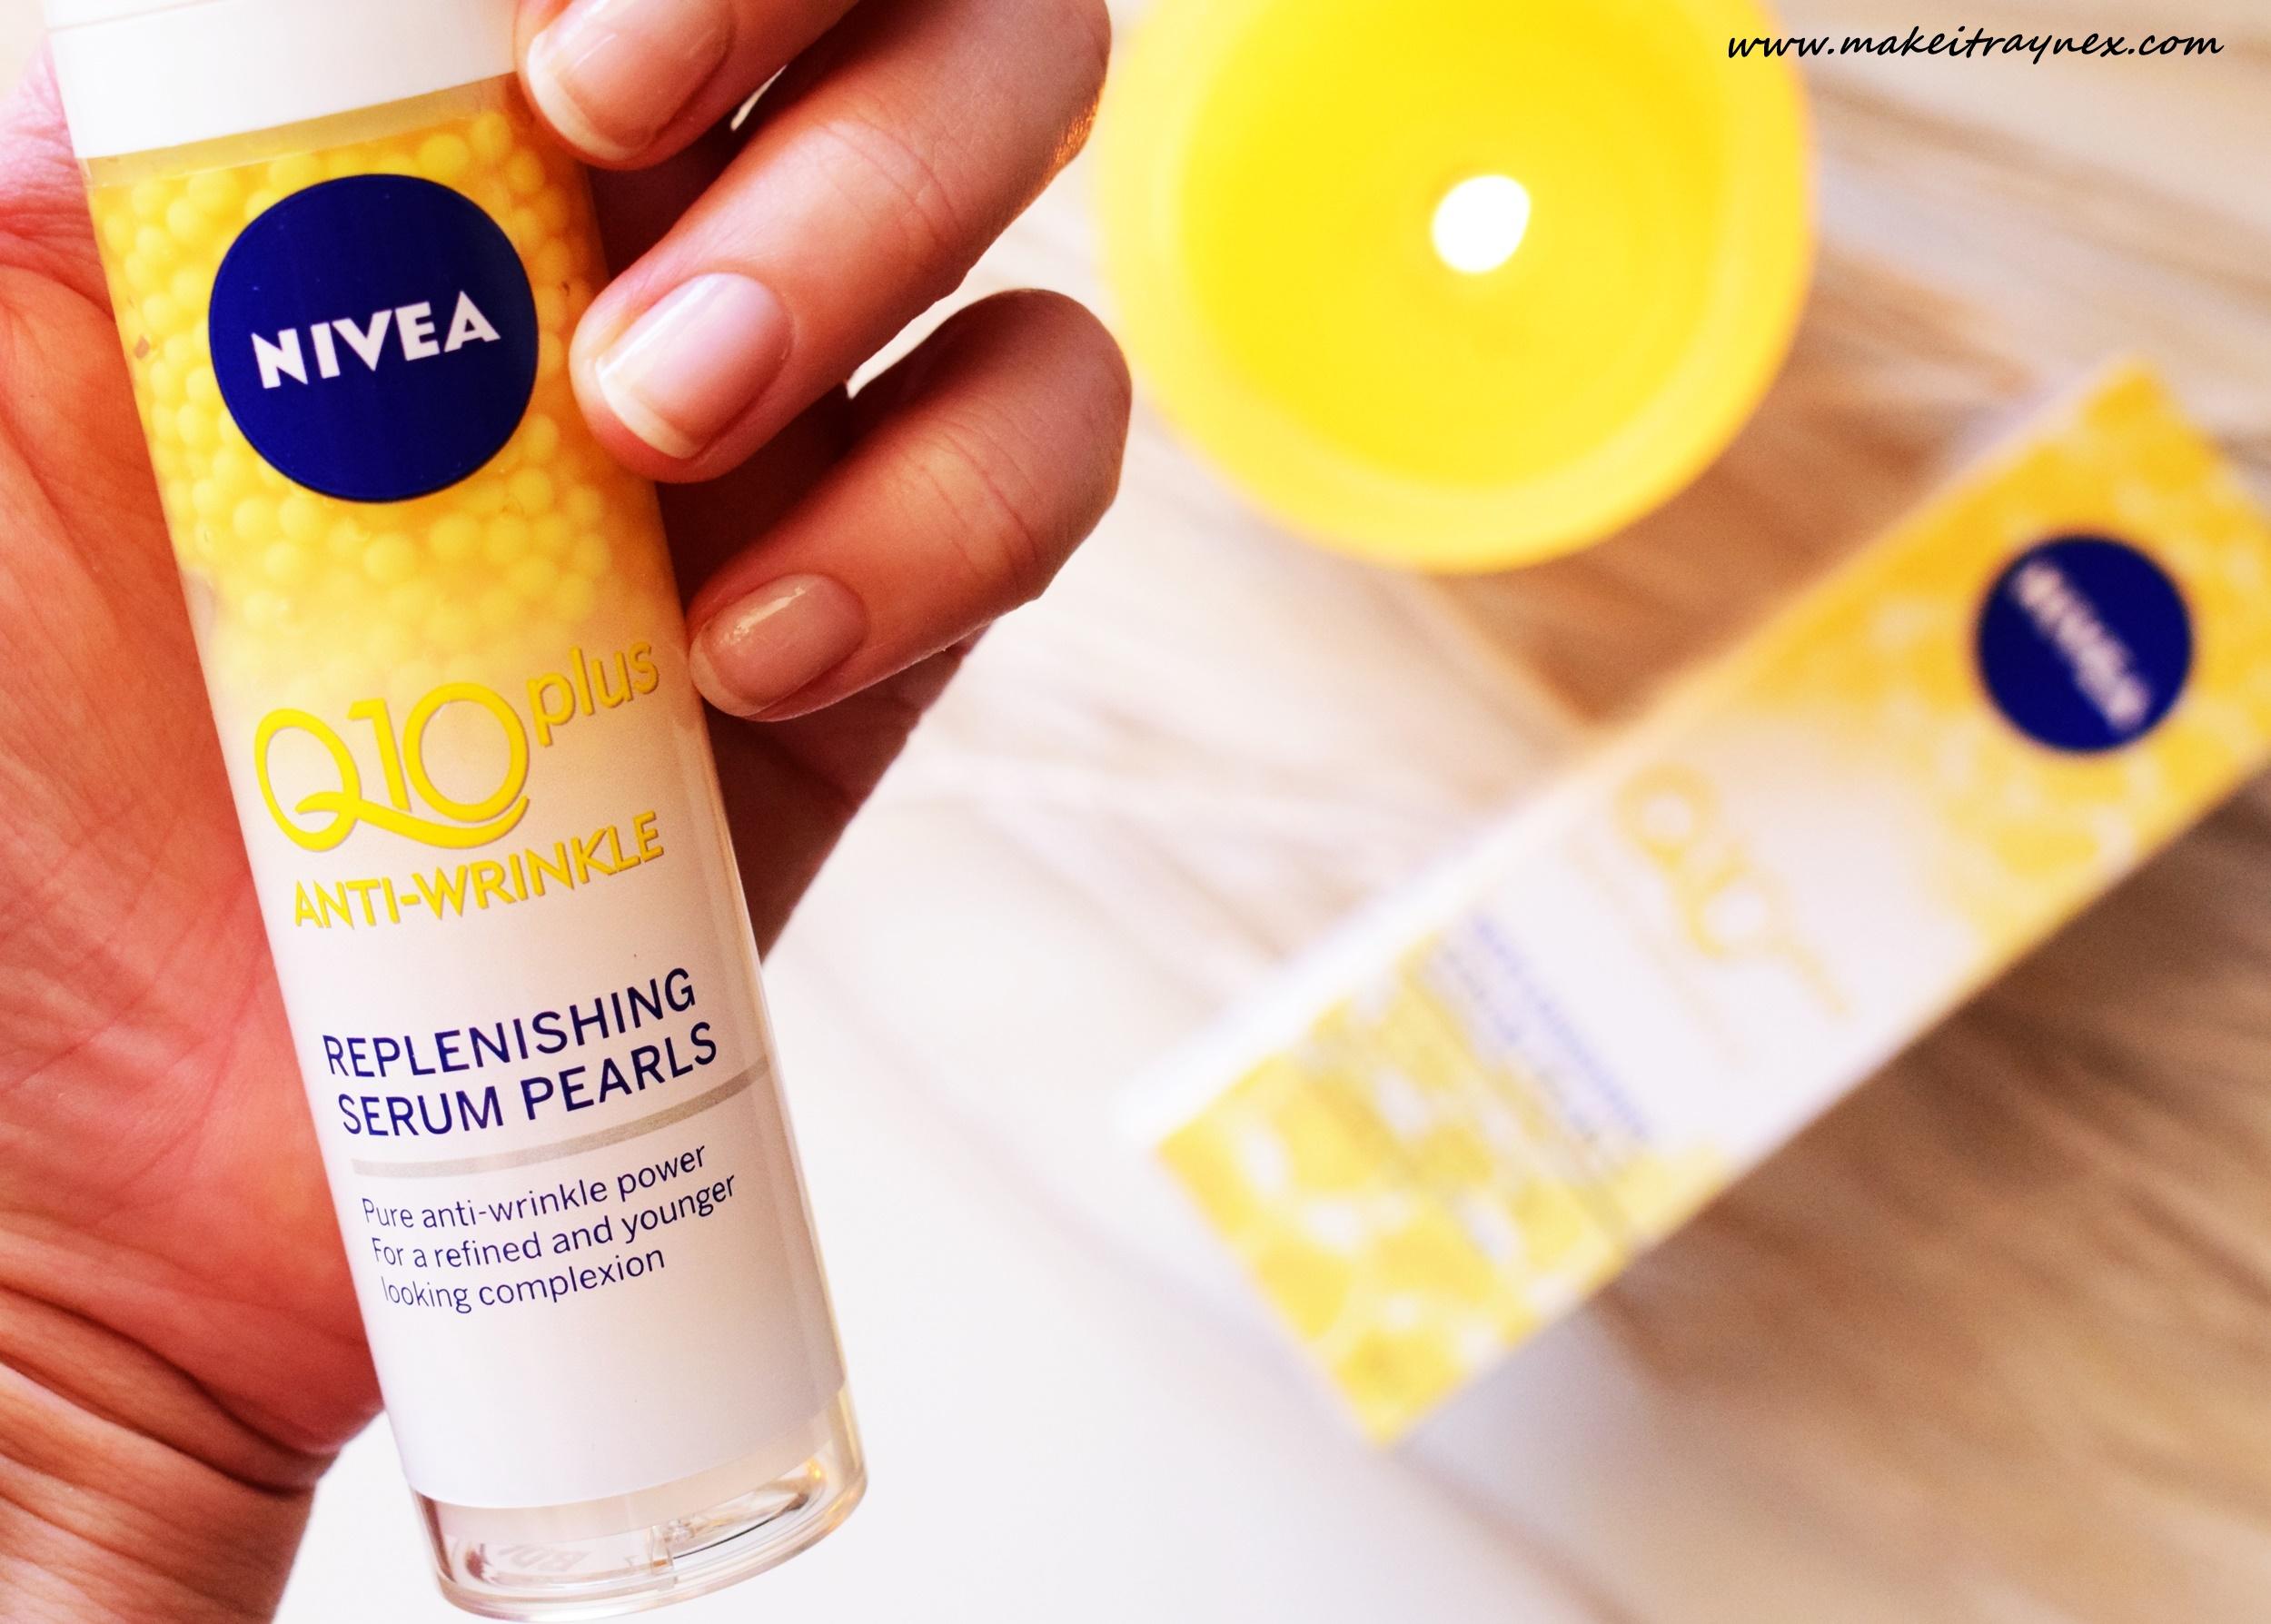 Q10 Plus Anti-Wrinkle Replenishing Serum Pearls from NIVEA {REVIEW}